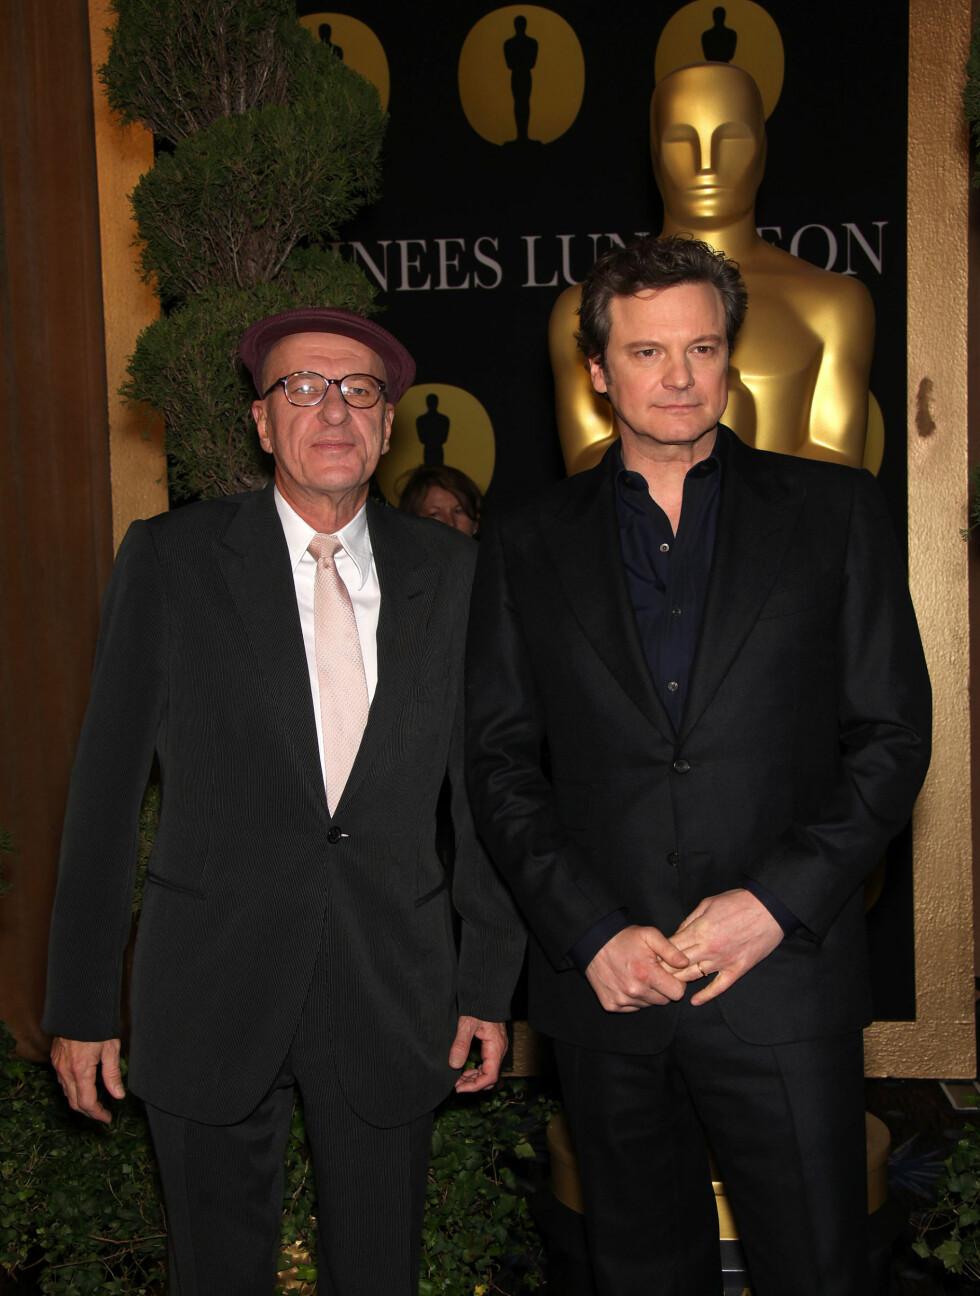 PÅ OSCAR-LUNSJ: Geofferey Rush og Colin Firth. Foto: Stella Pictures